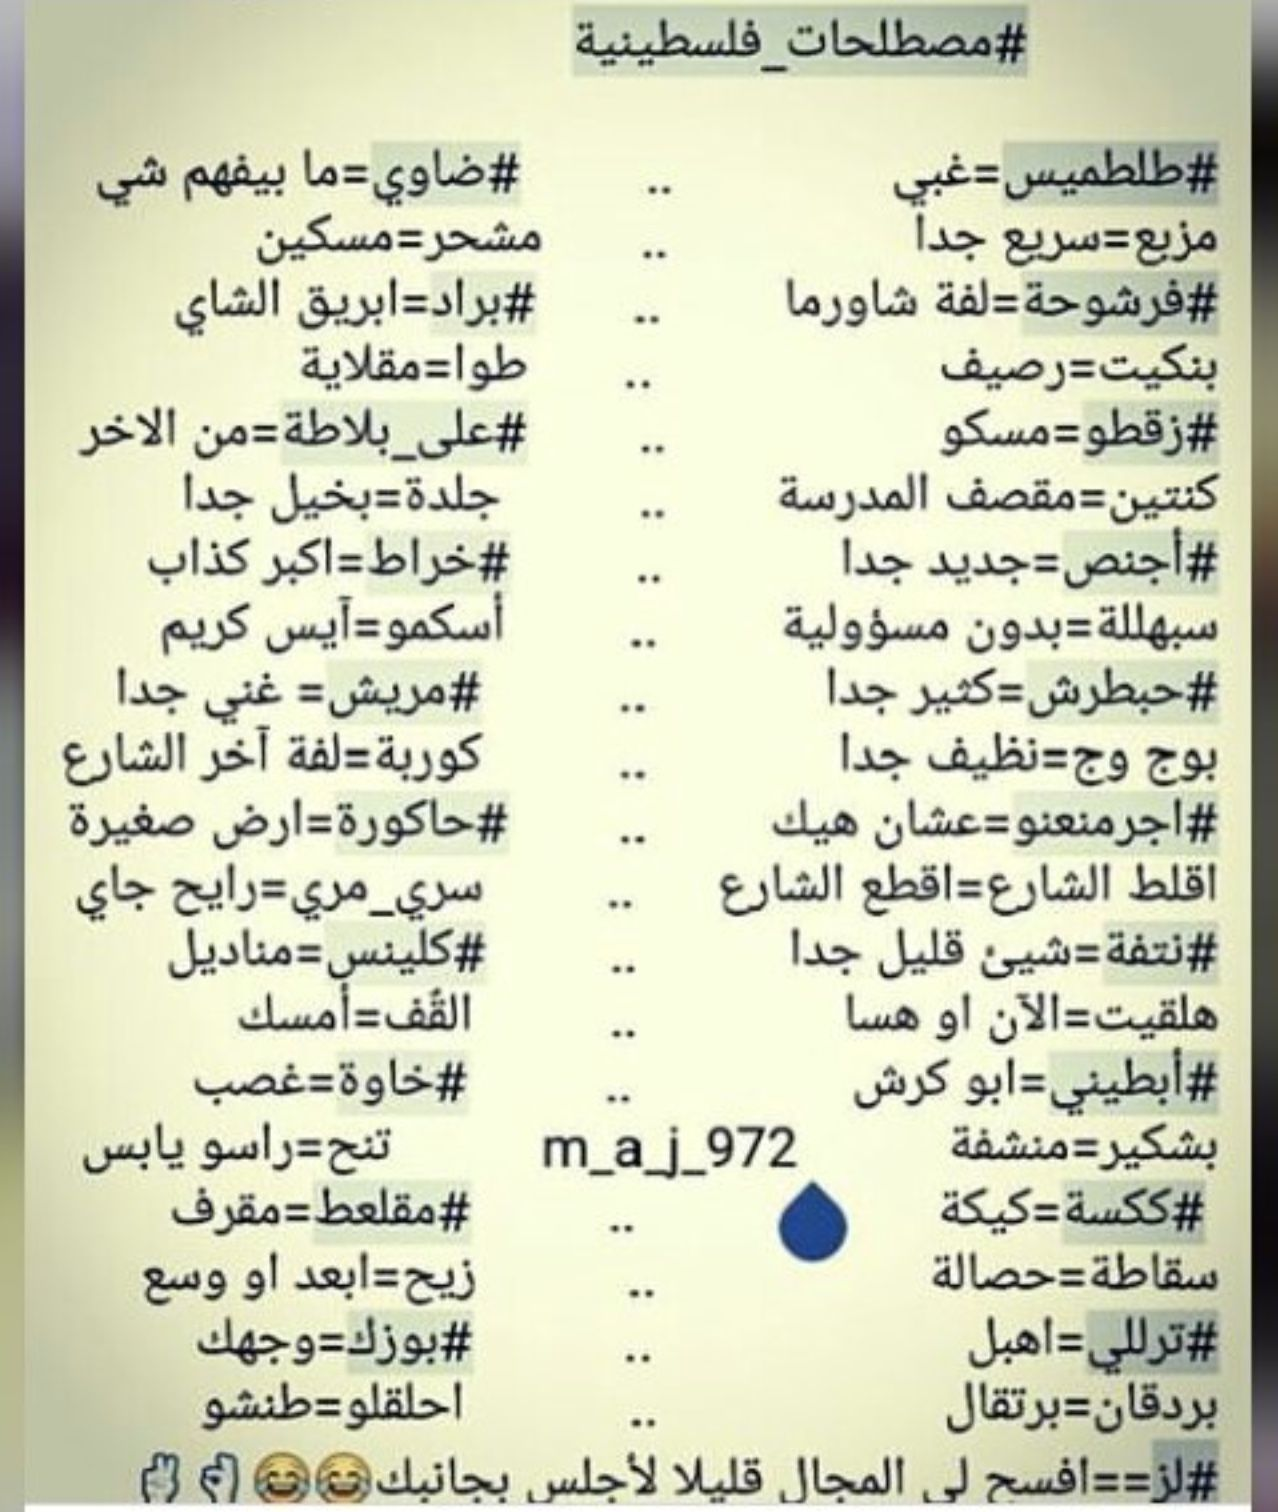 مصطلحات فلسطينية Palestine Quotes Quotes Islamic Messages